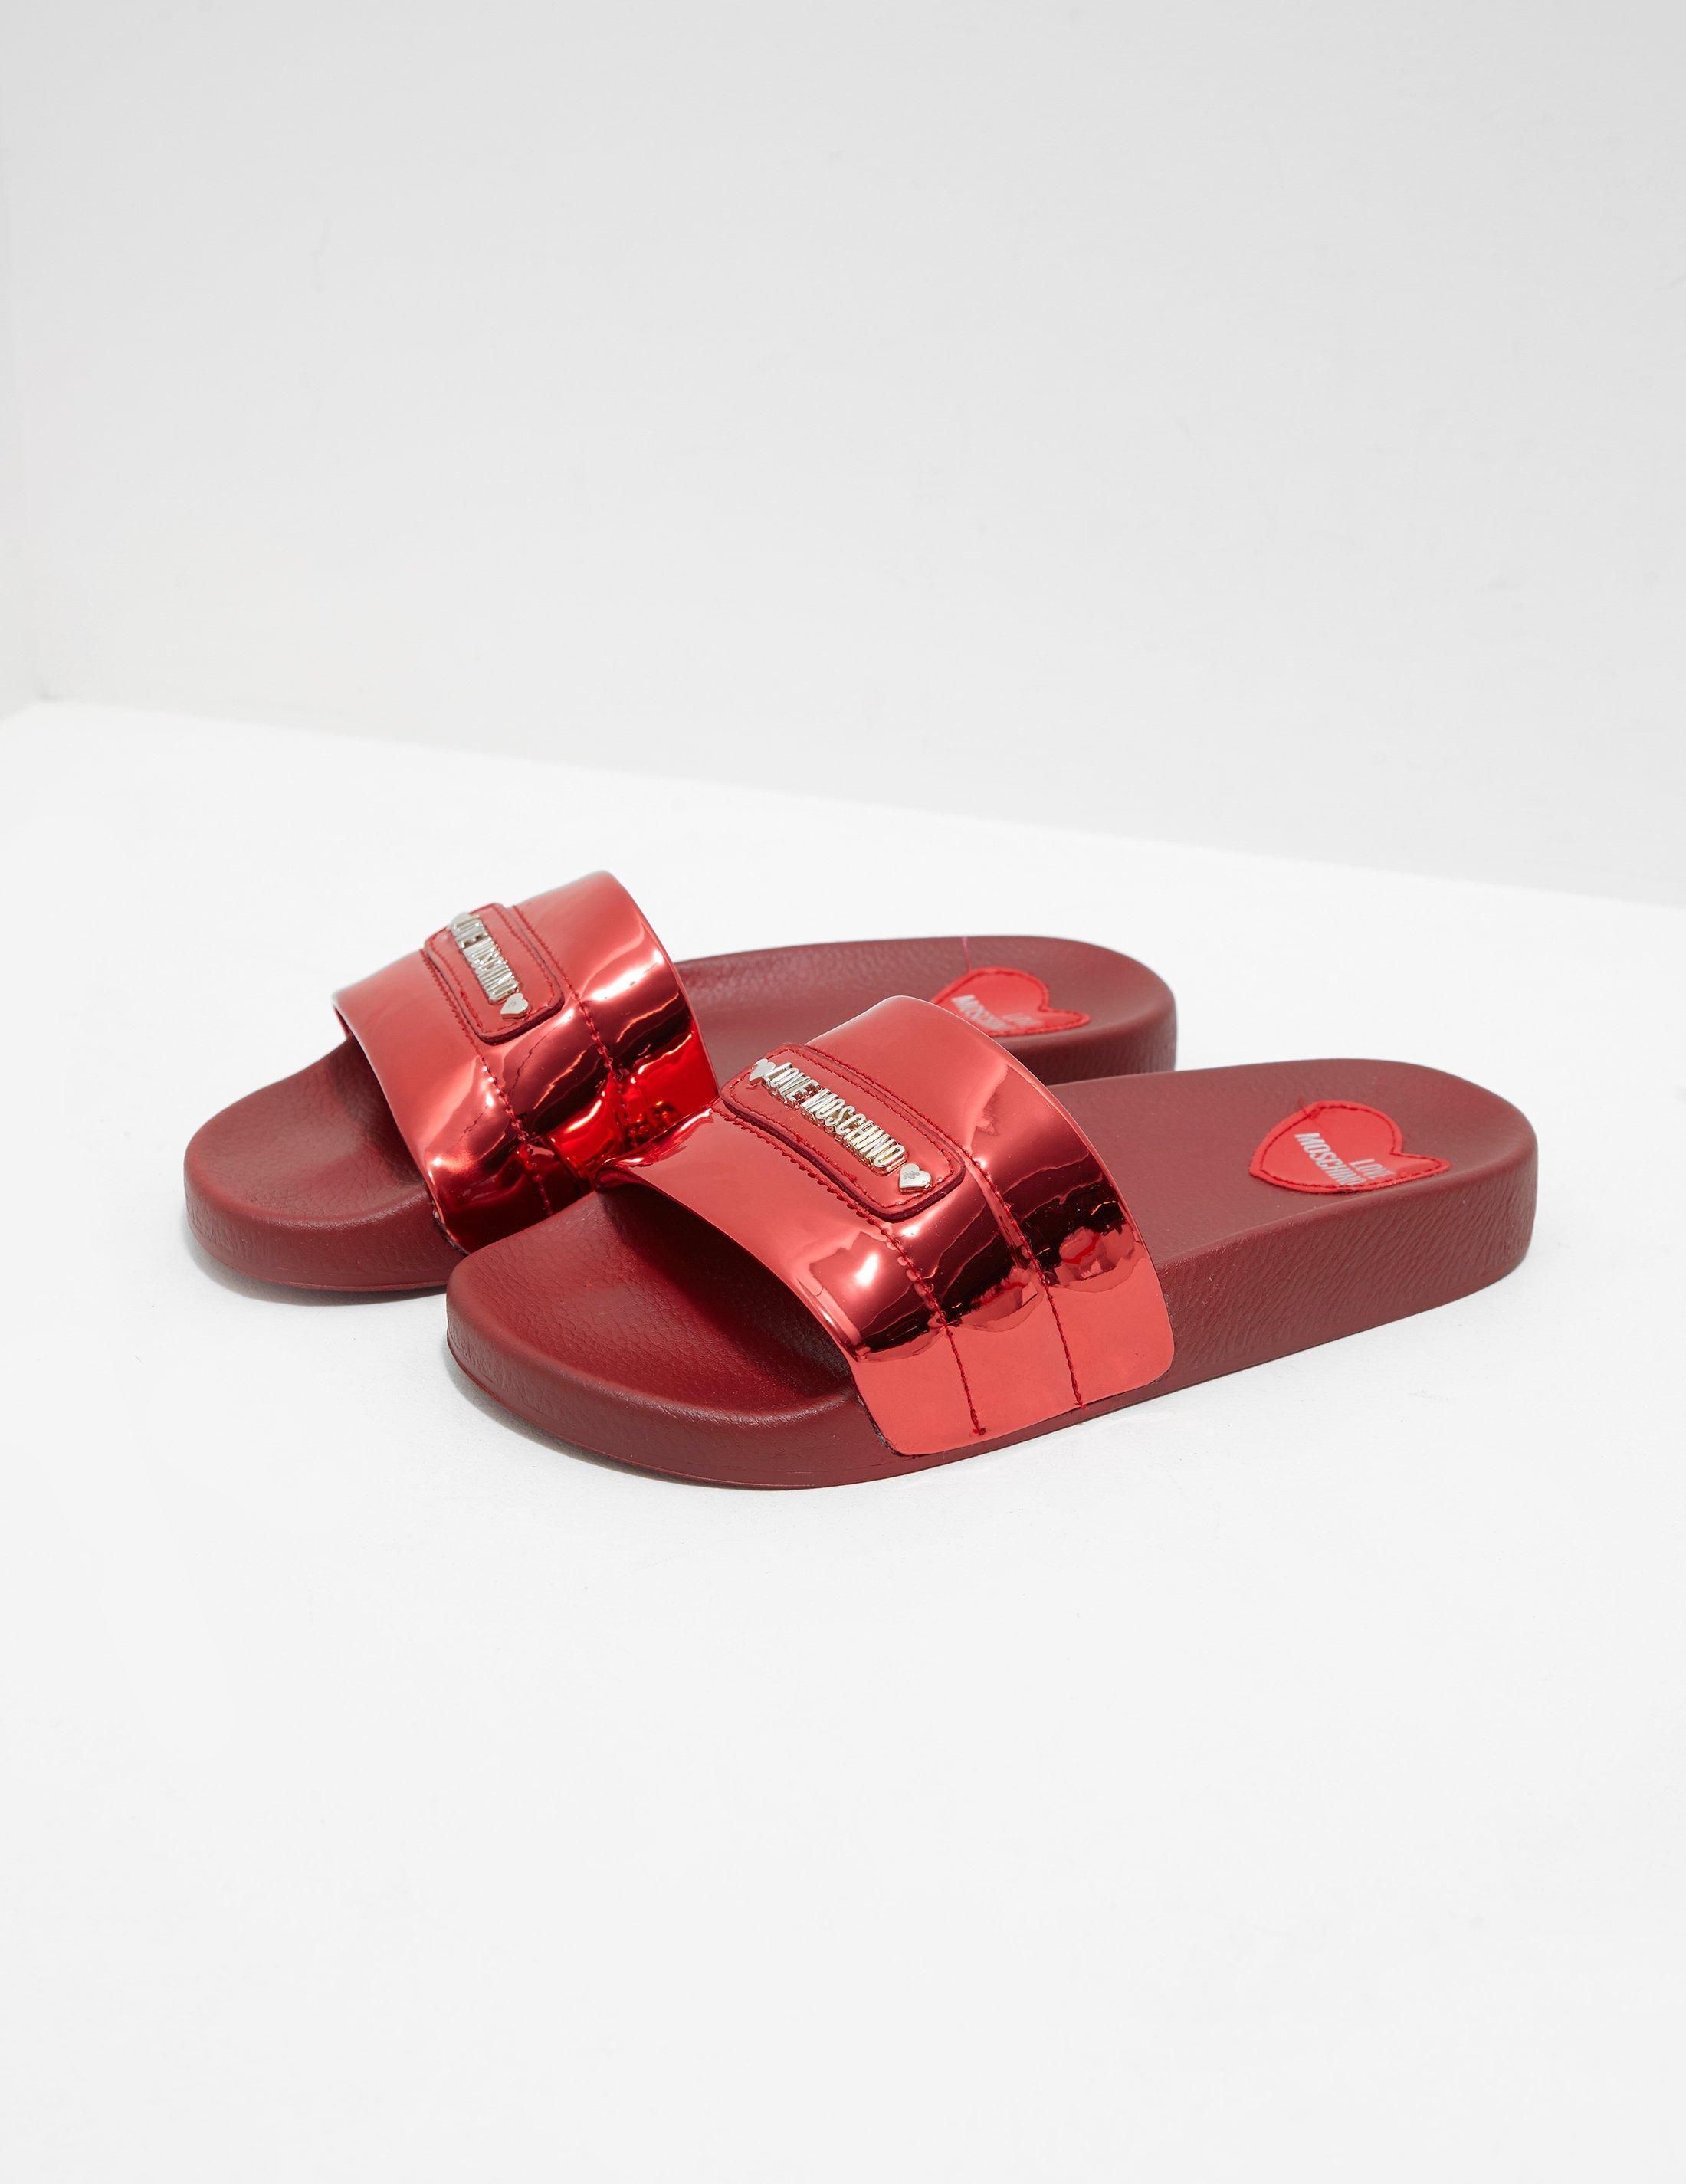 3d8675b821d4 Lyst - Love Moschino  s Sabotd.pool25 Specchio Pu Flip Flops in Red